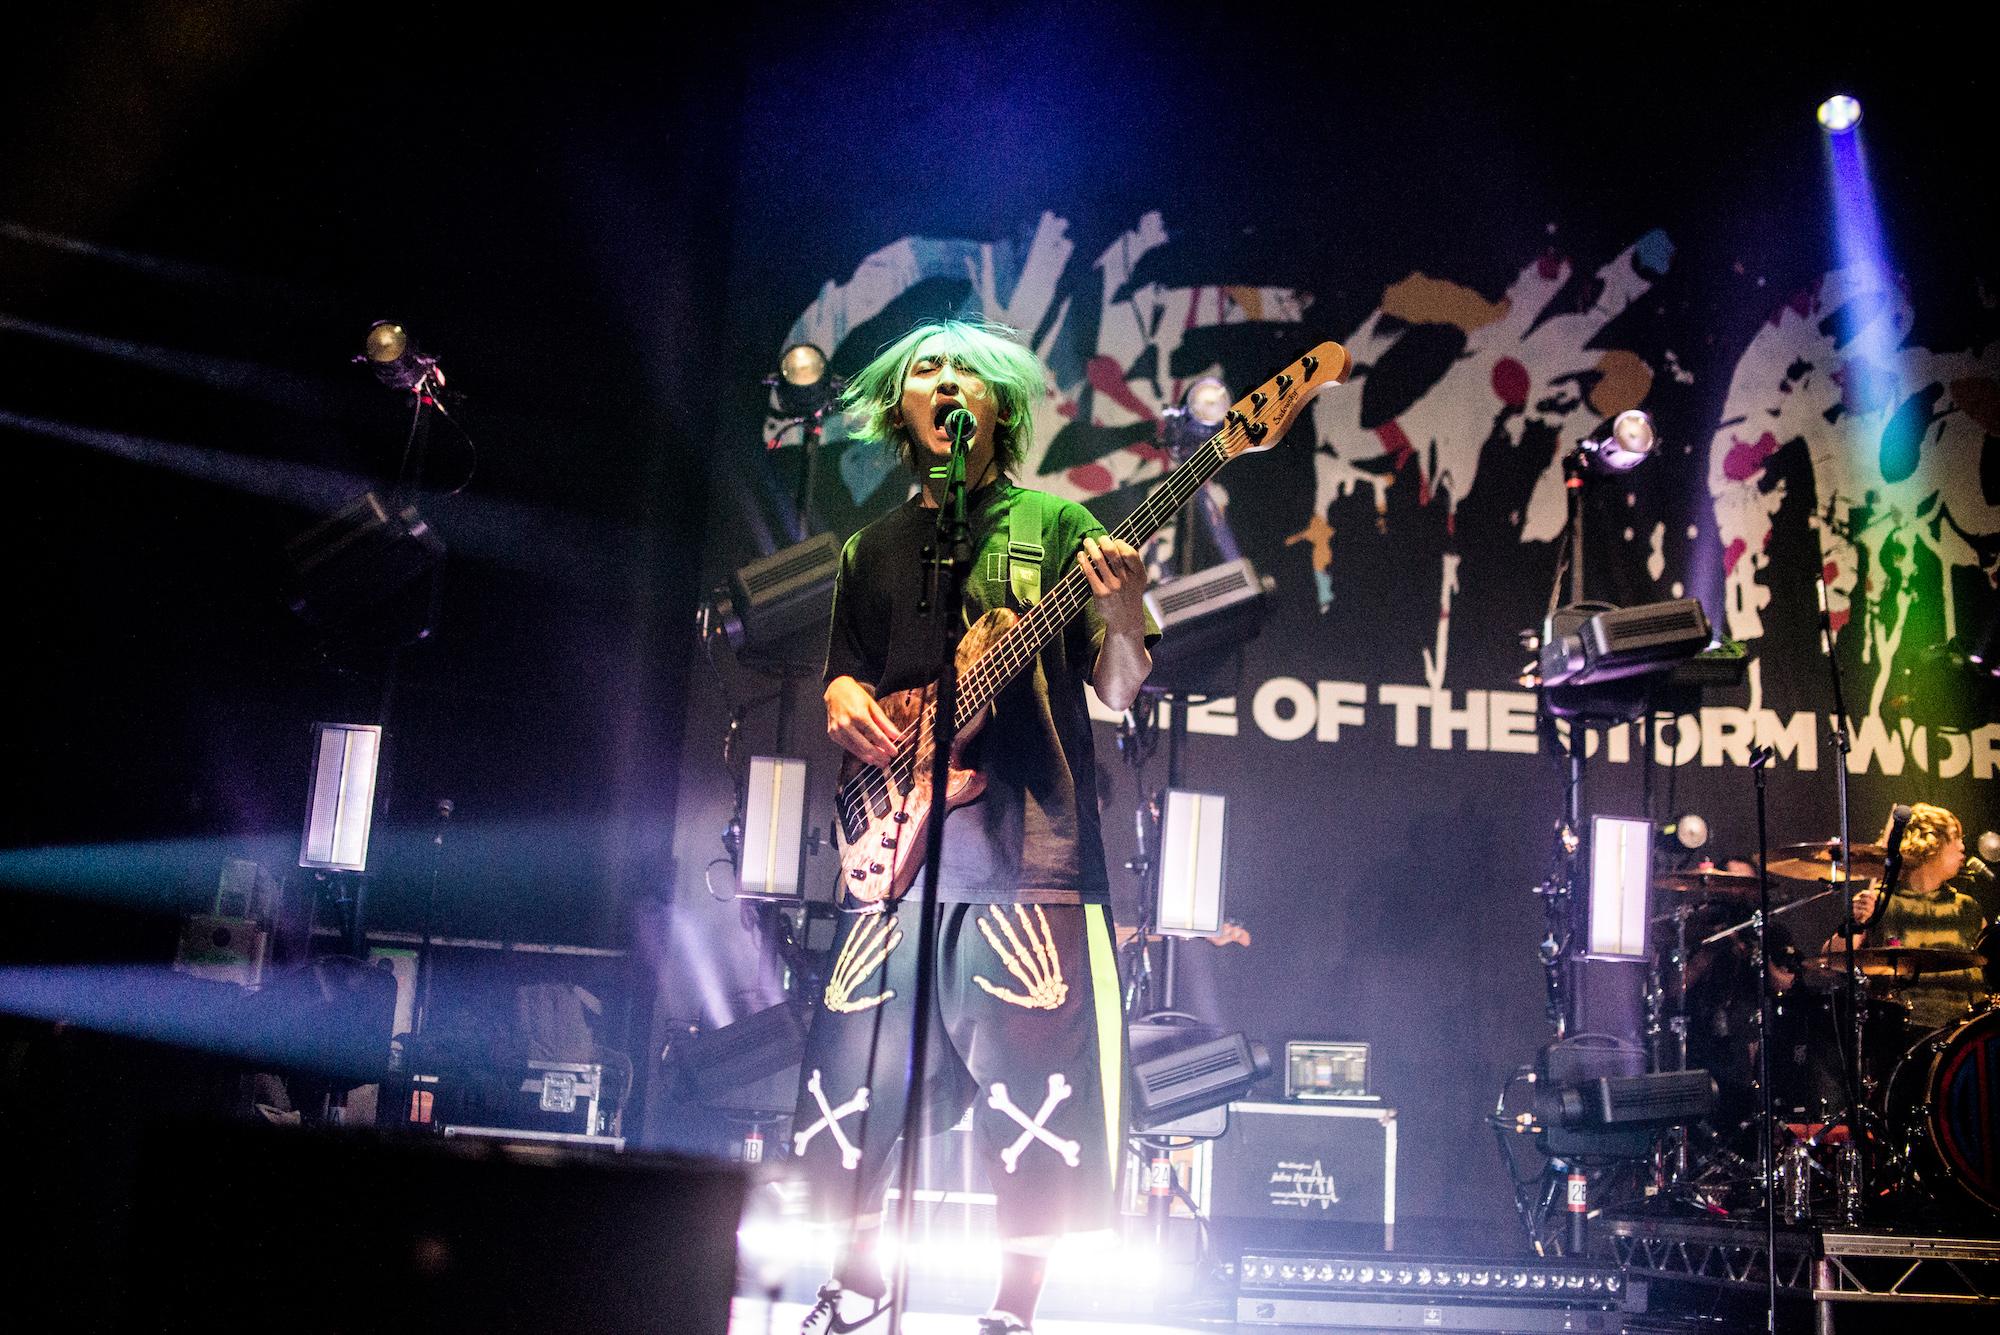 PHOTO GALLERY: One Ok Rock | Highlight Magazine